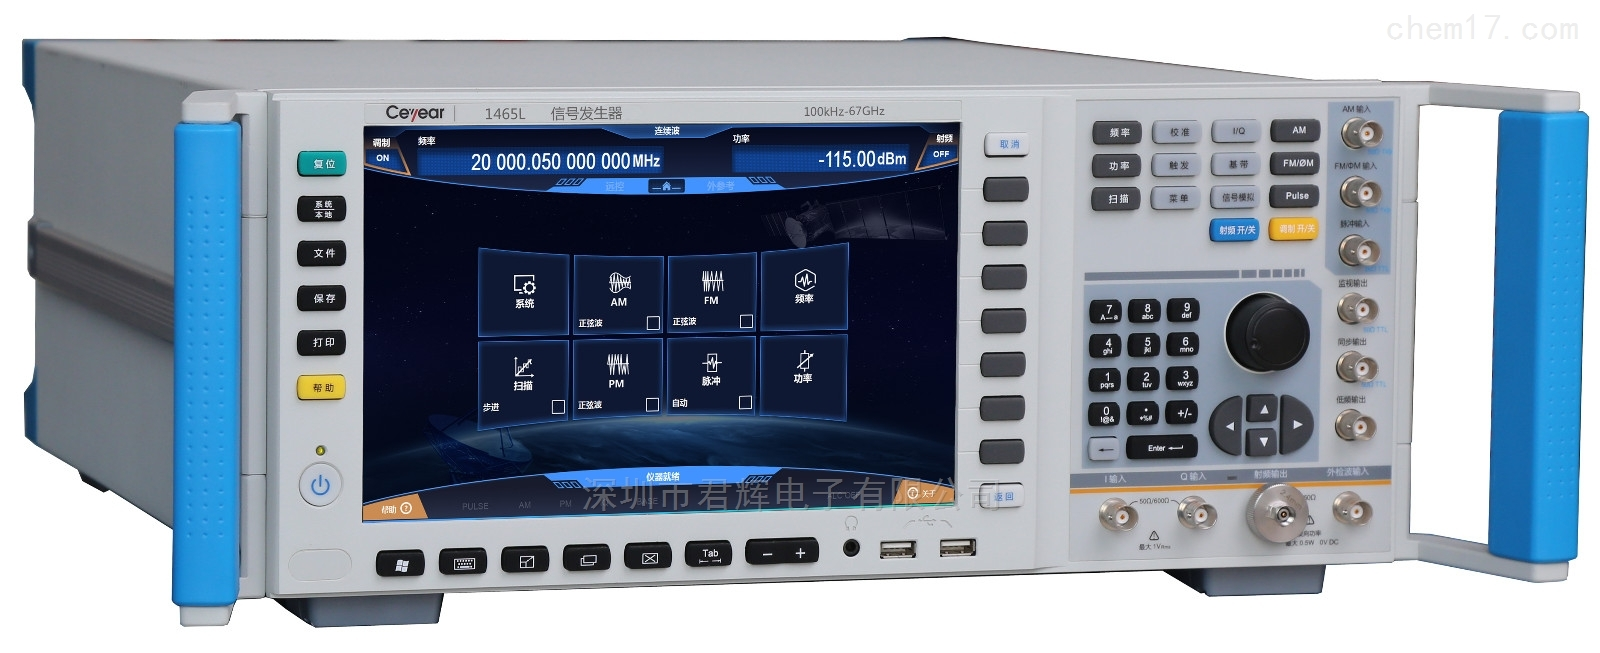 ceyear思仪1465A/B/C/D/F/H/L信号发生器